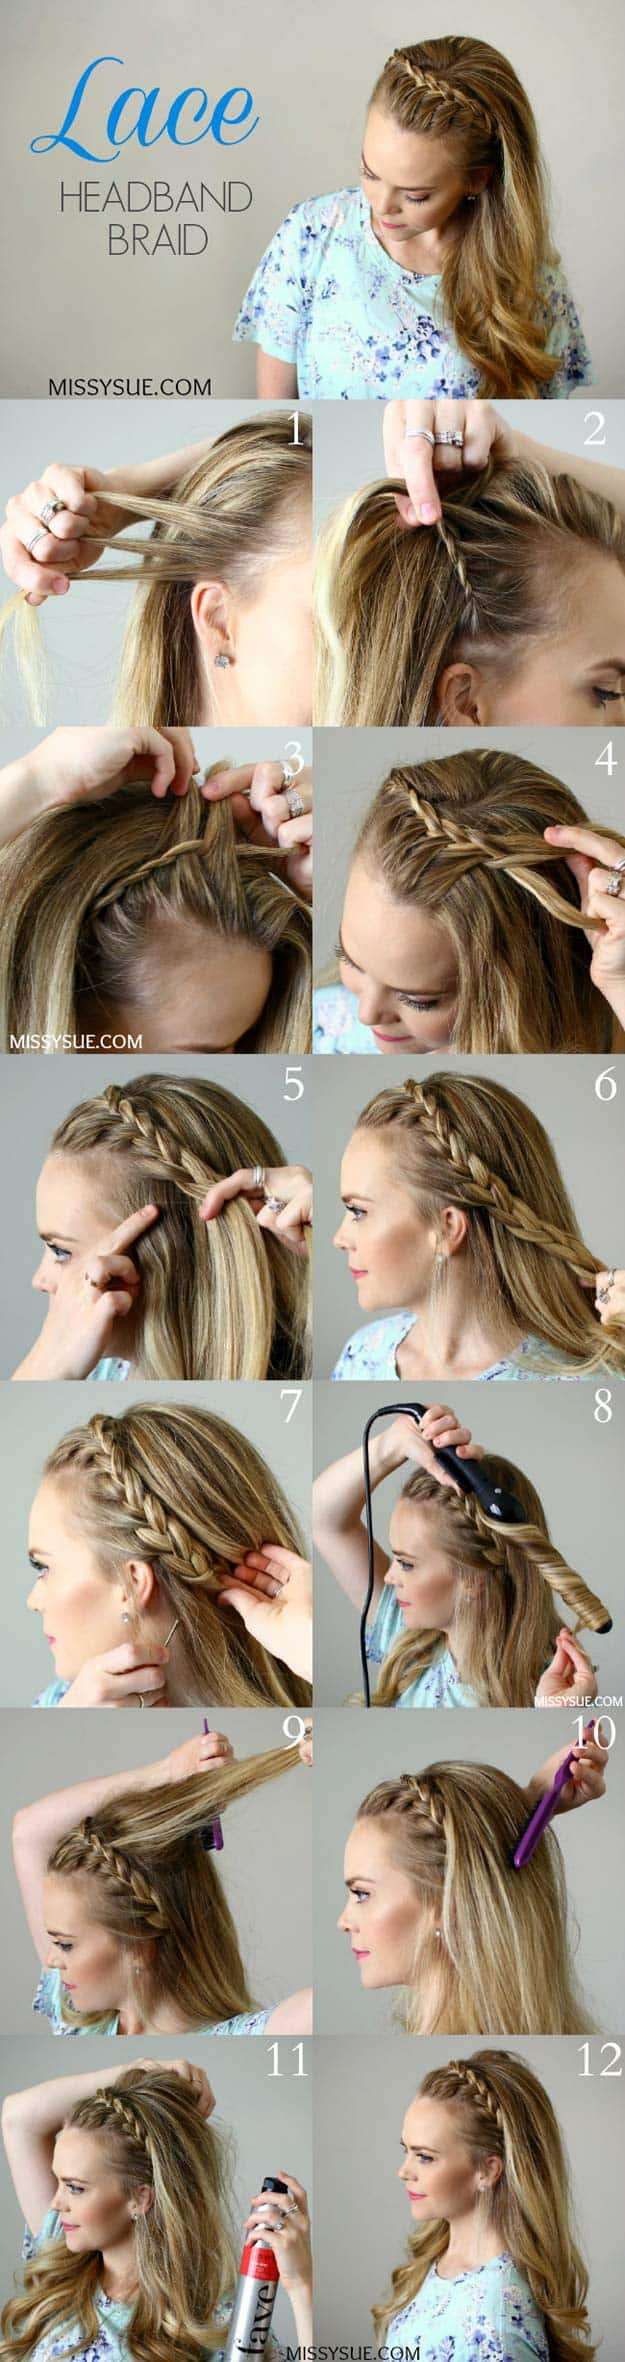 Lace hairband braid